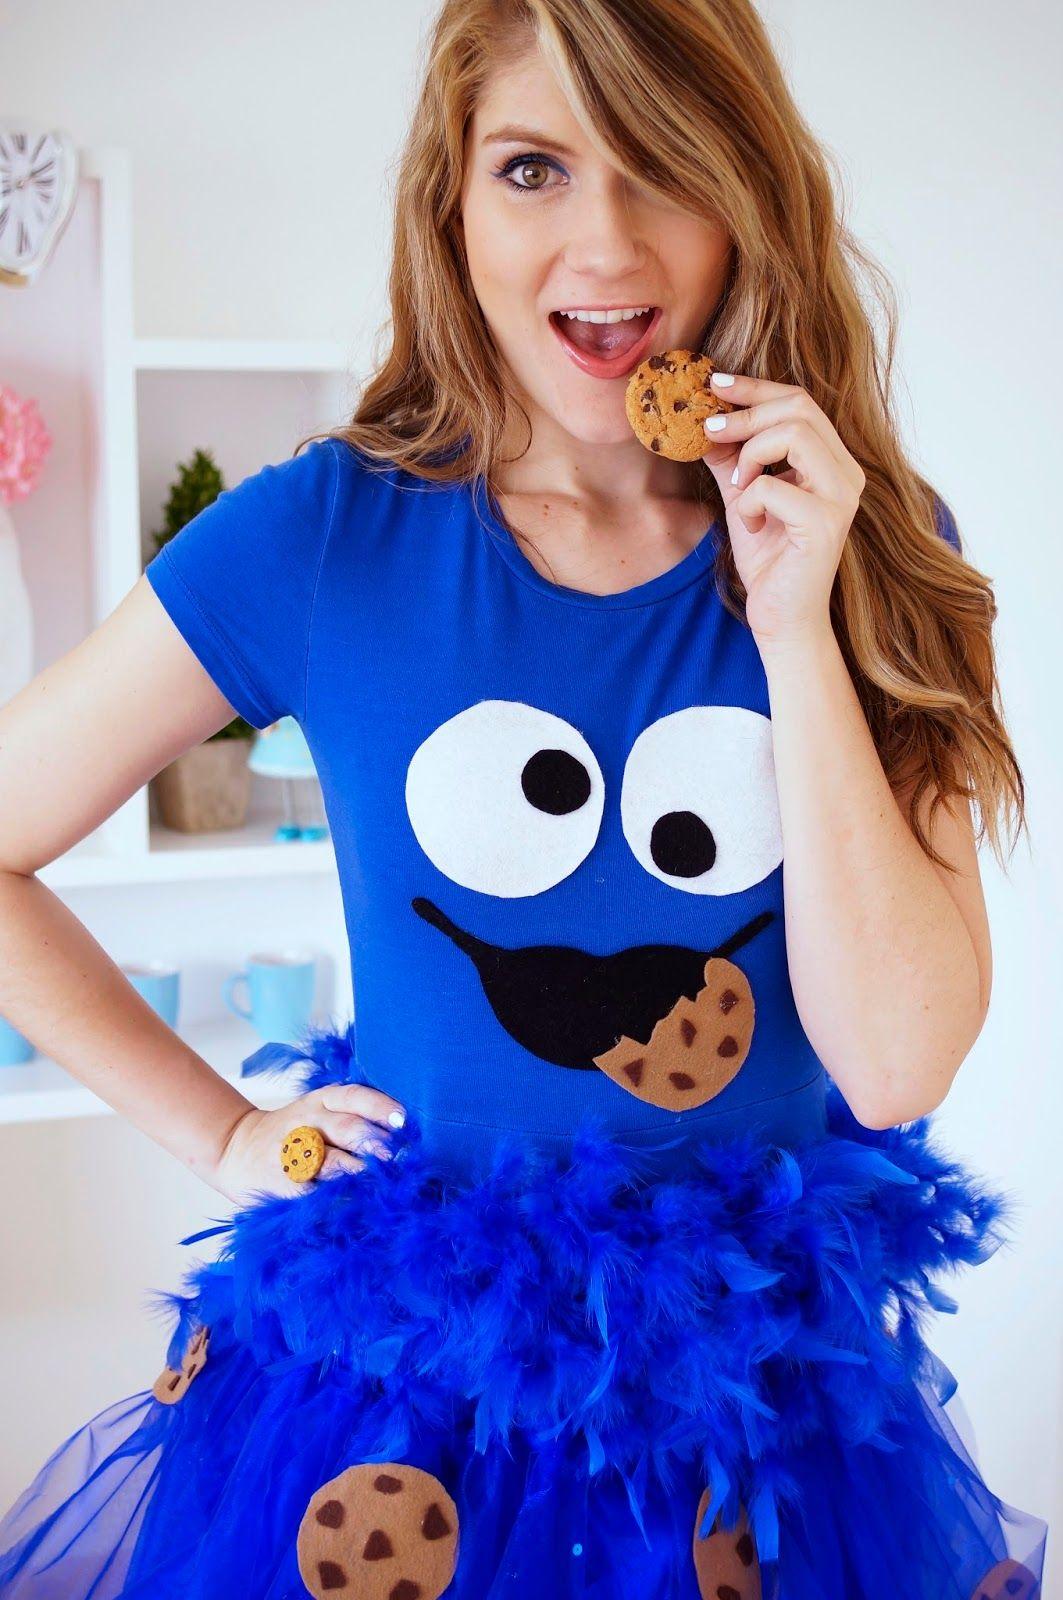 Cute Halloween Costume Ideas | Cool costume ideas | Pinterest ...